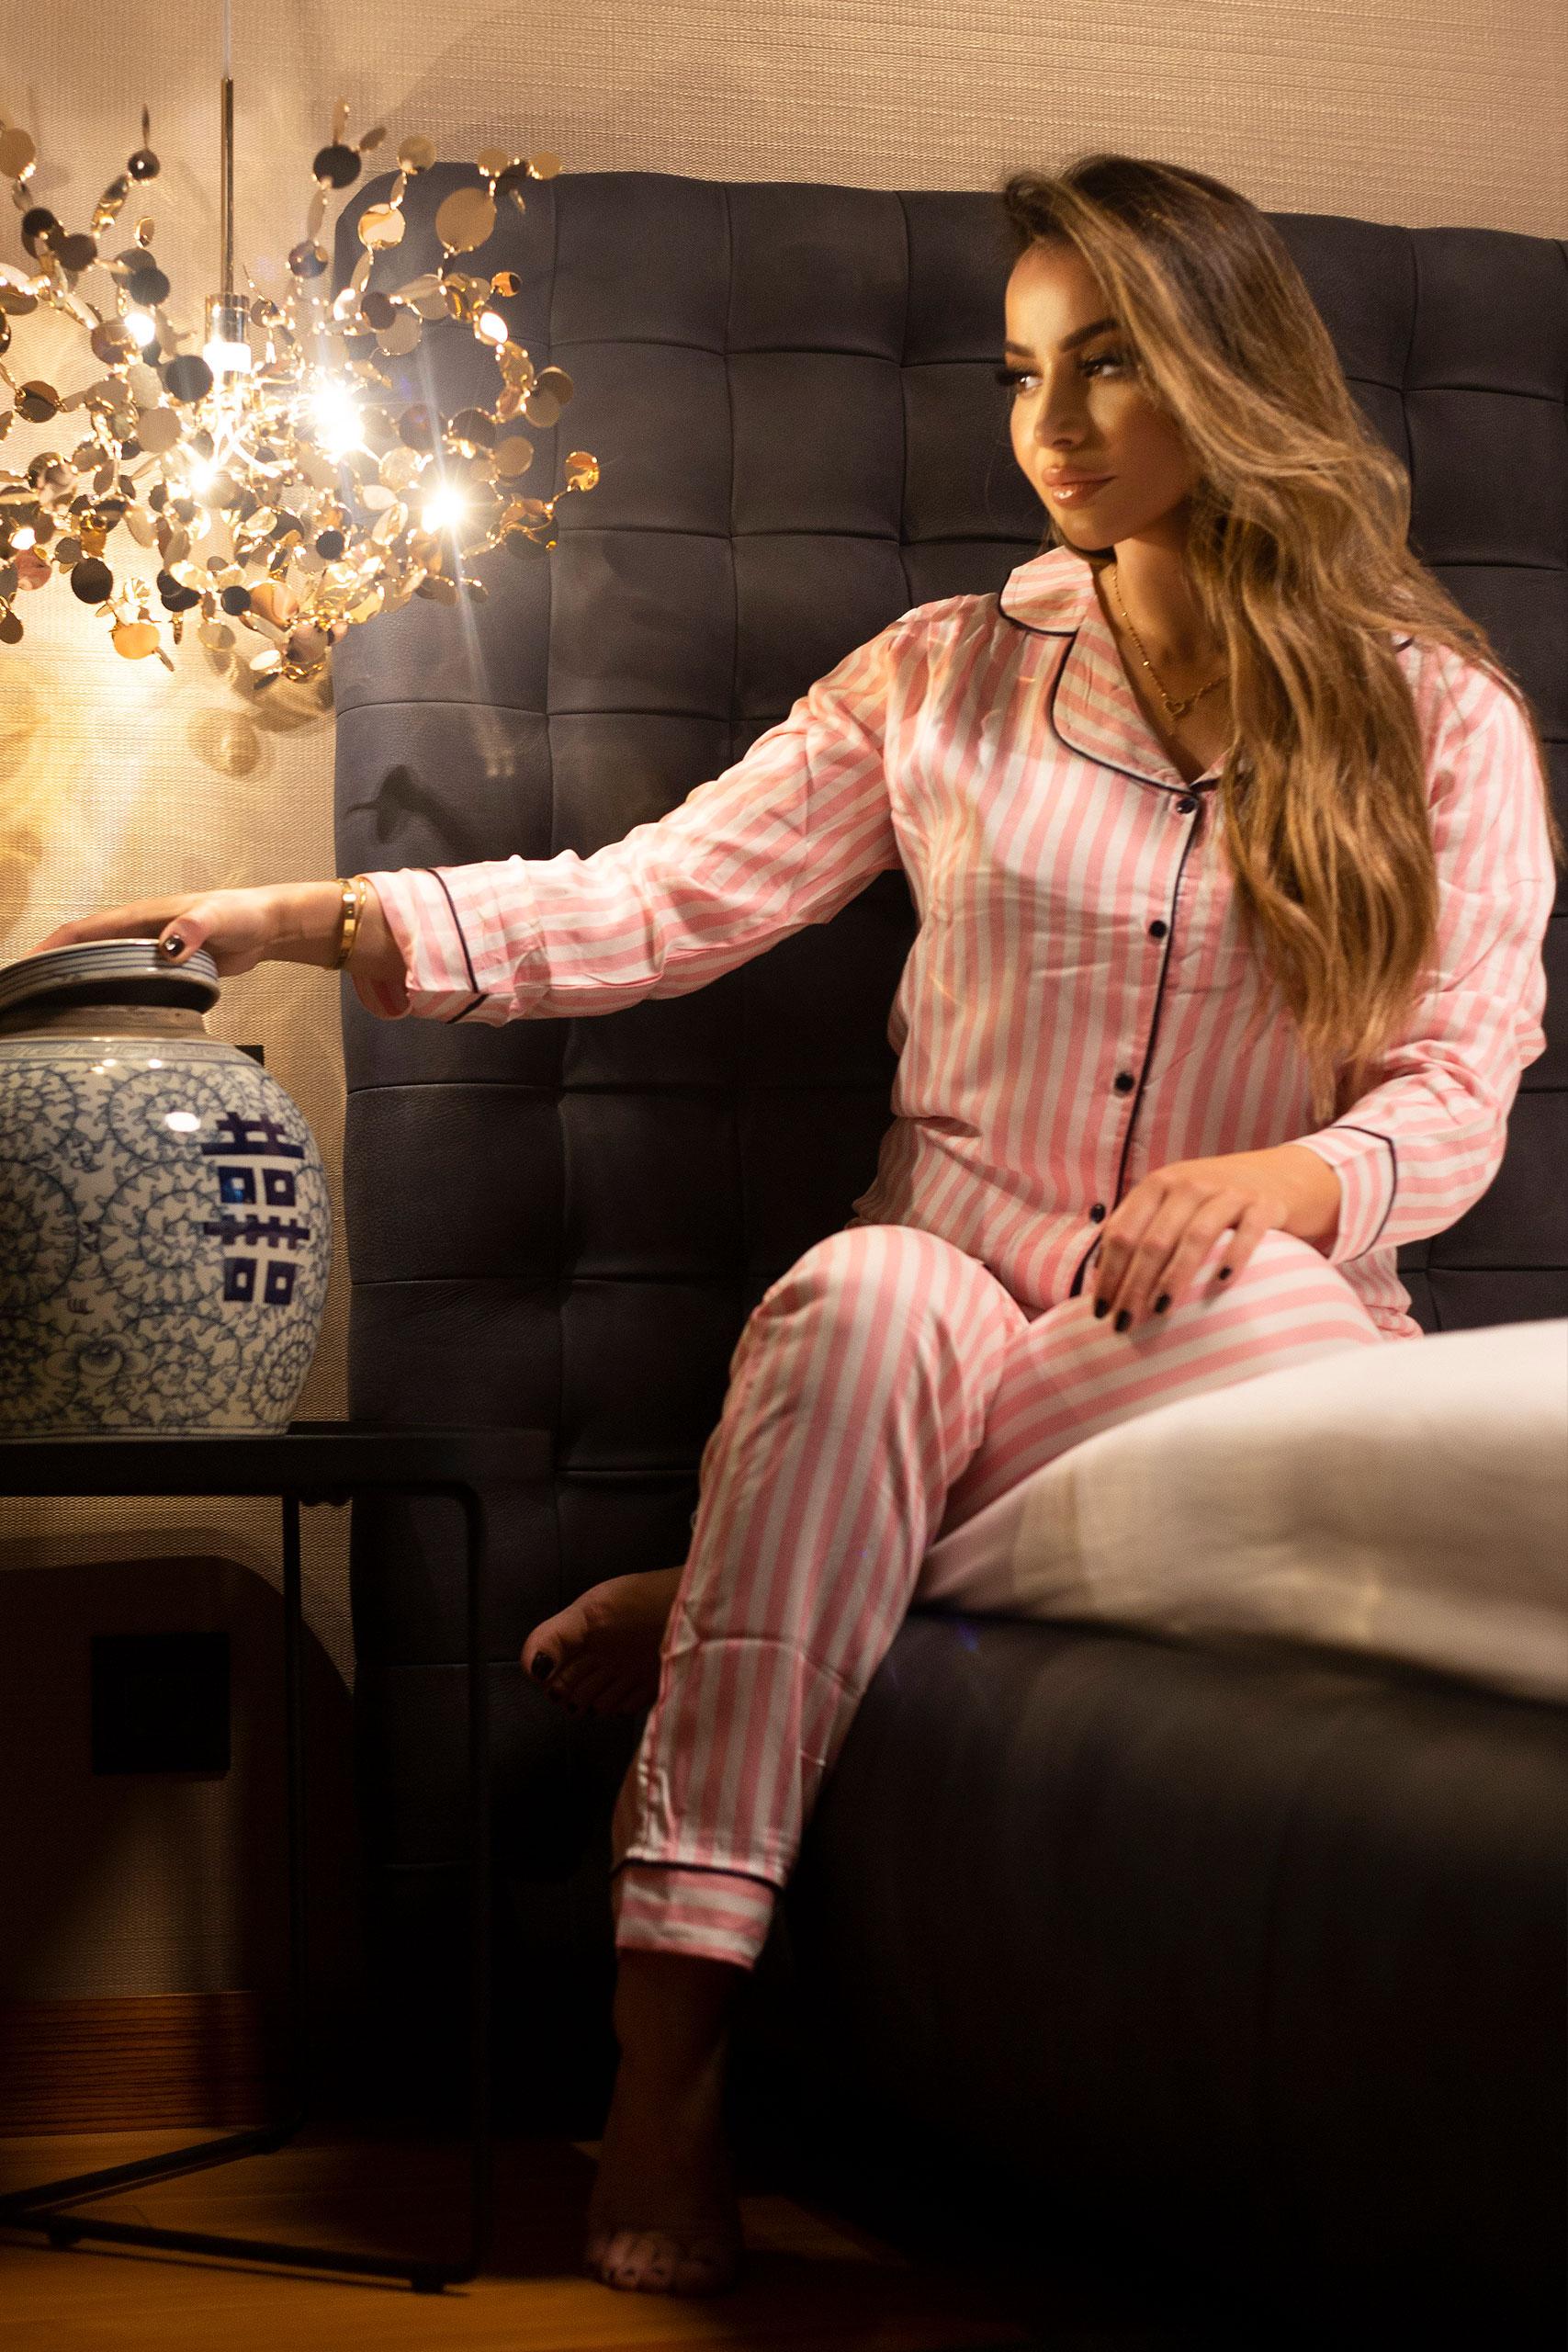 lunaria nightwear & lingerie